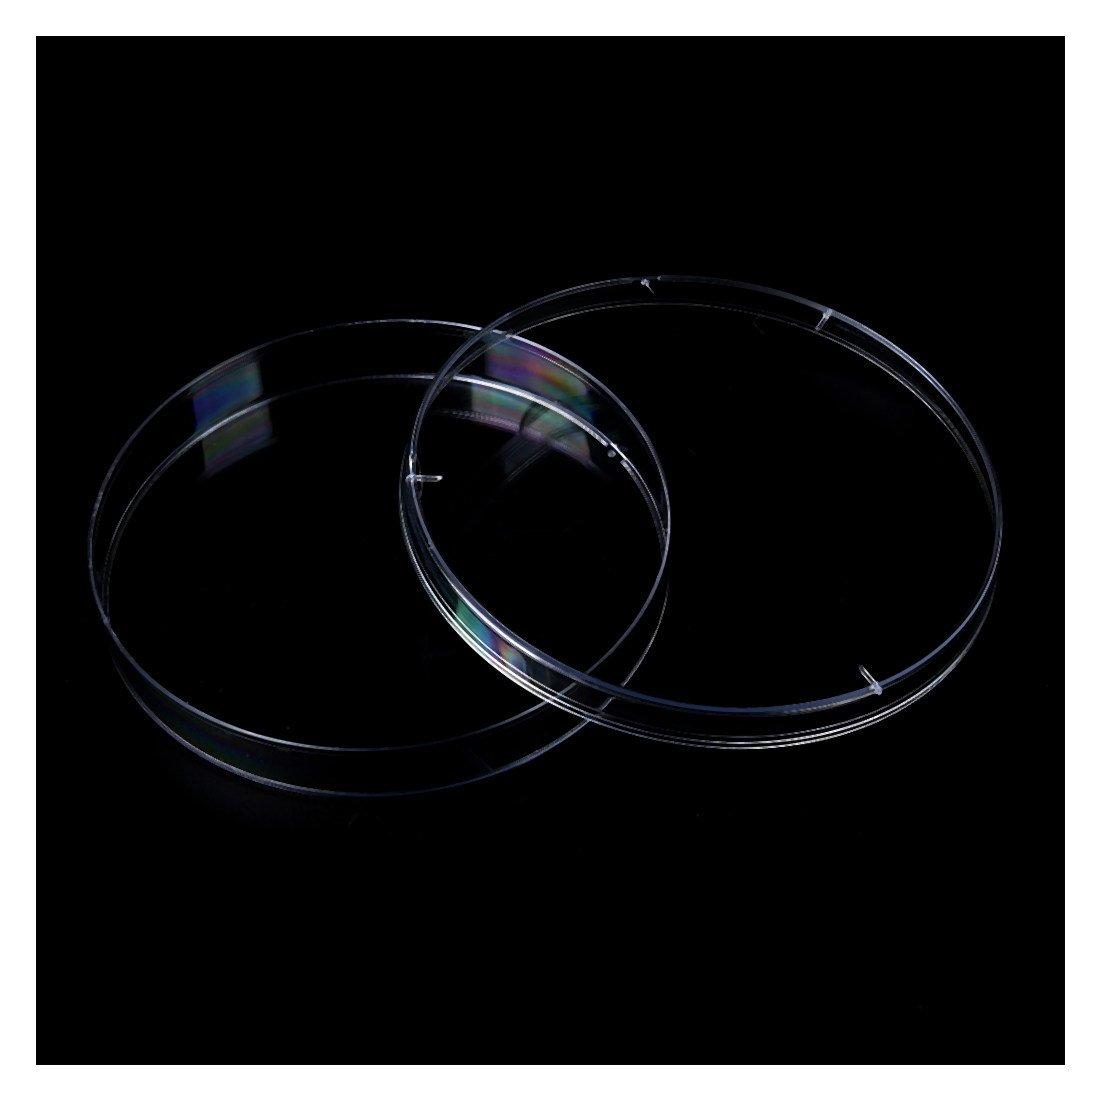 R TOOGOO 10PCS Sterile Plastic Petri Dishes PLATES Bacterial Yeast 90x15mm